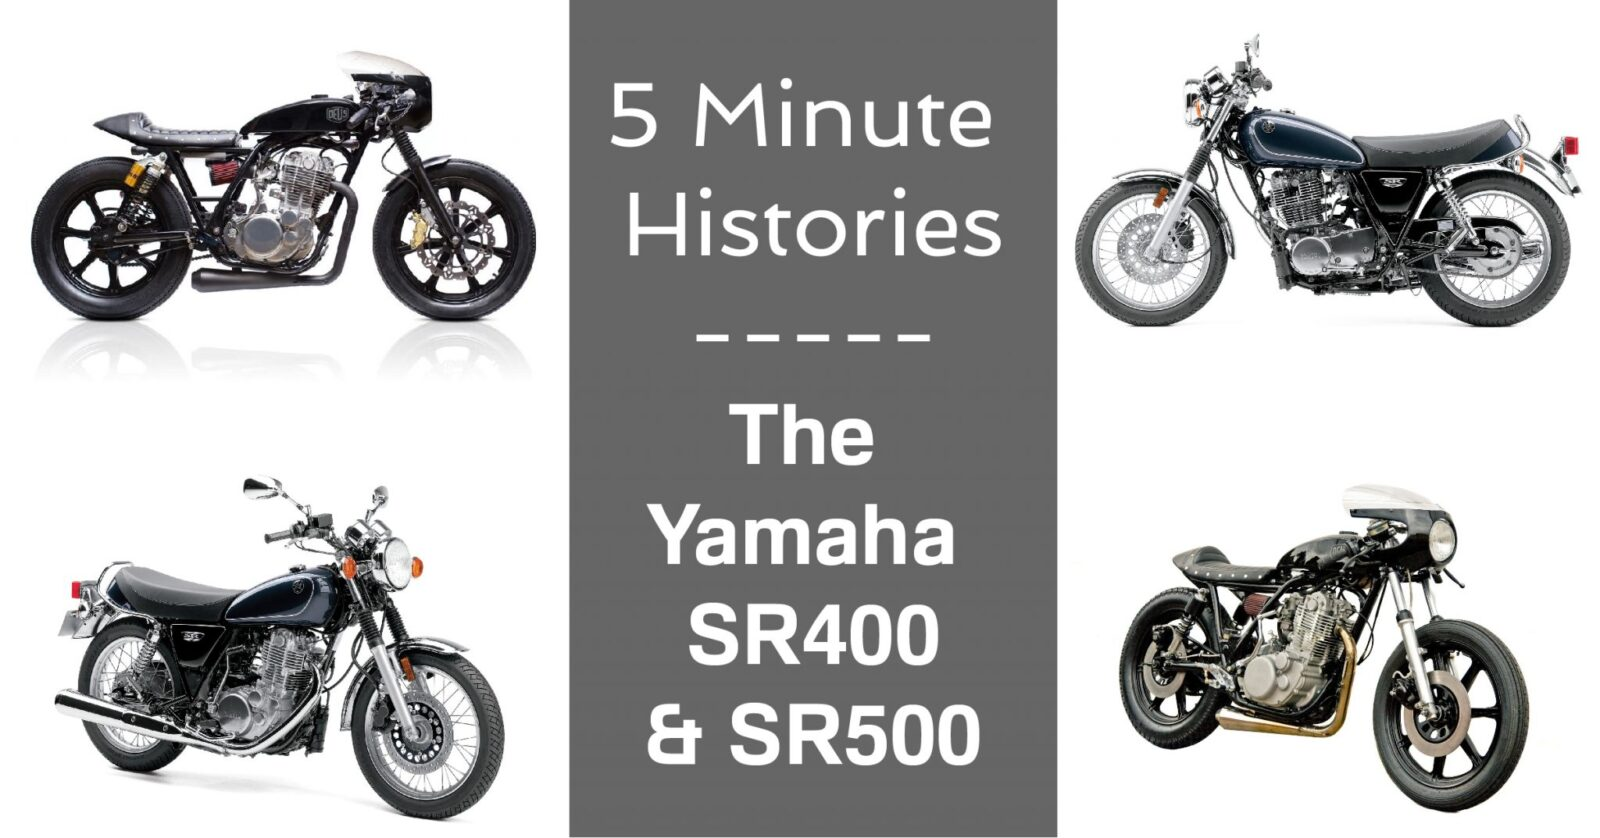 eBay Facebook 5 Minute Template Yamaha SR400 SR500 1600x838 - 5 Minute Histories: The Yamaha SR400 & SR500